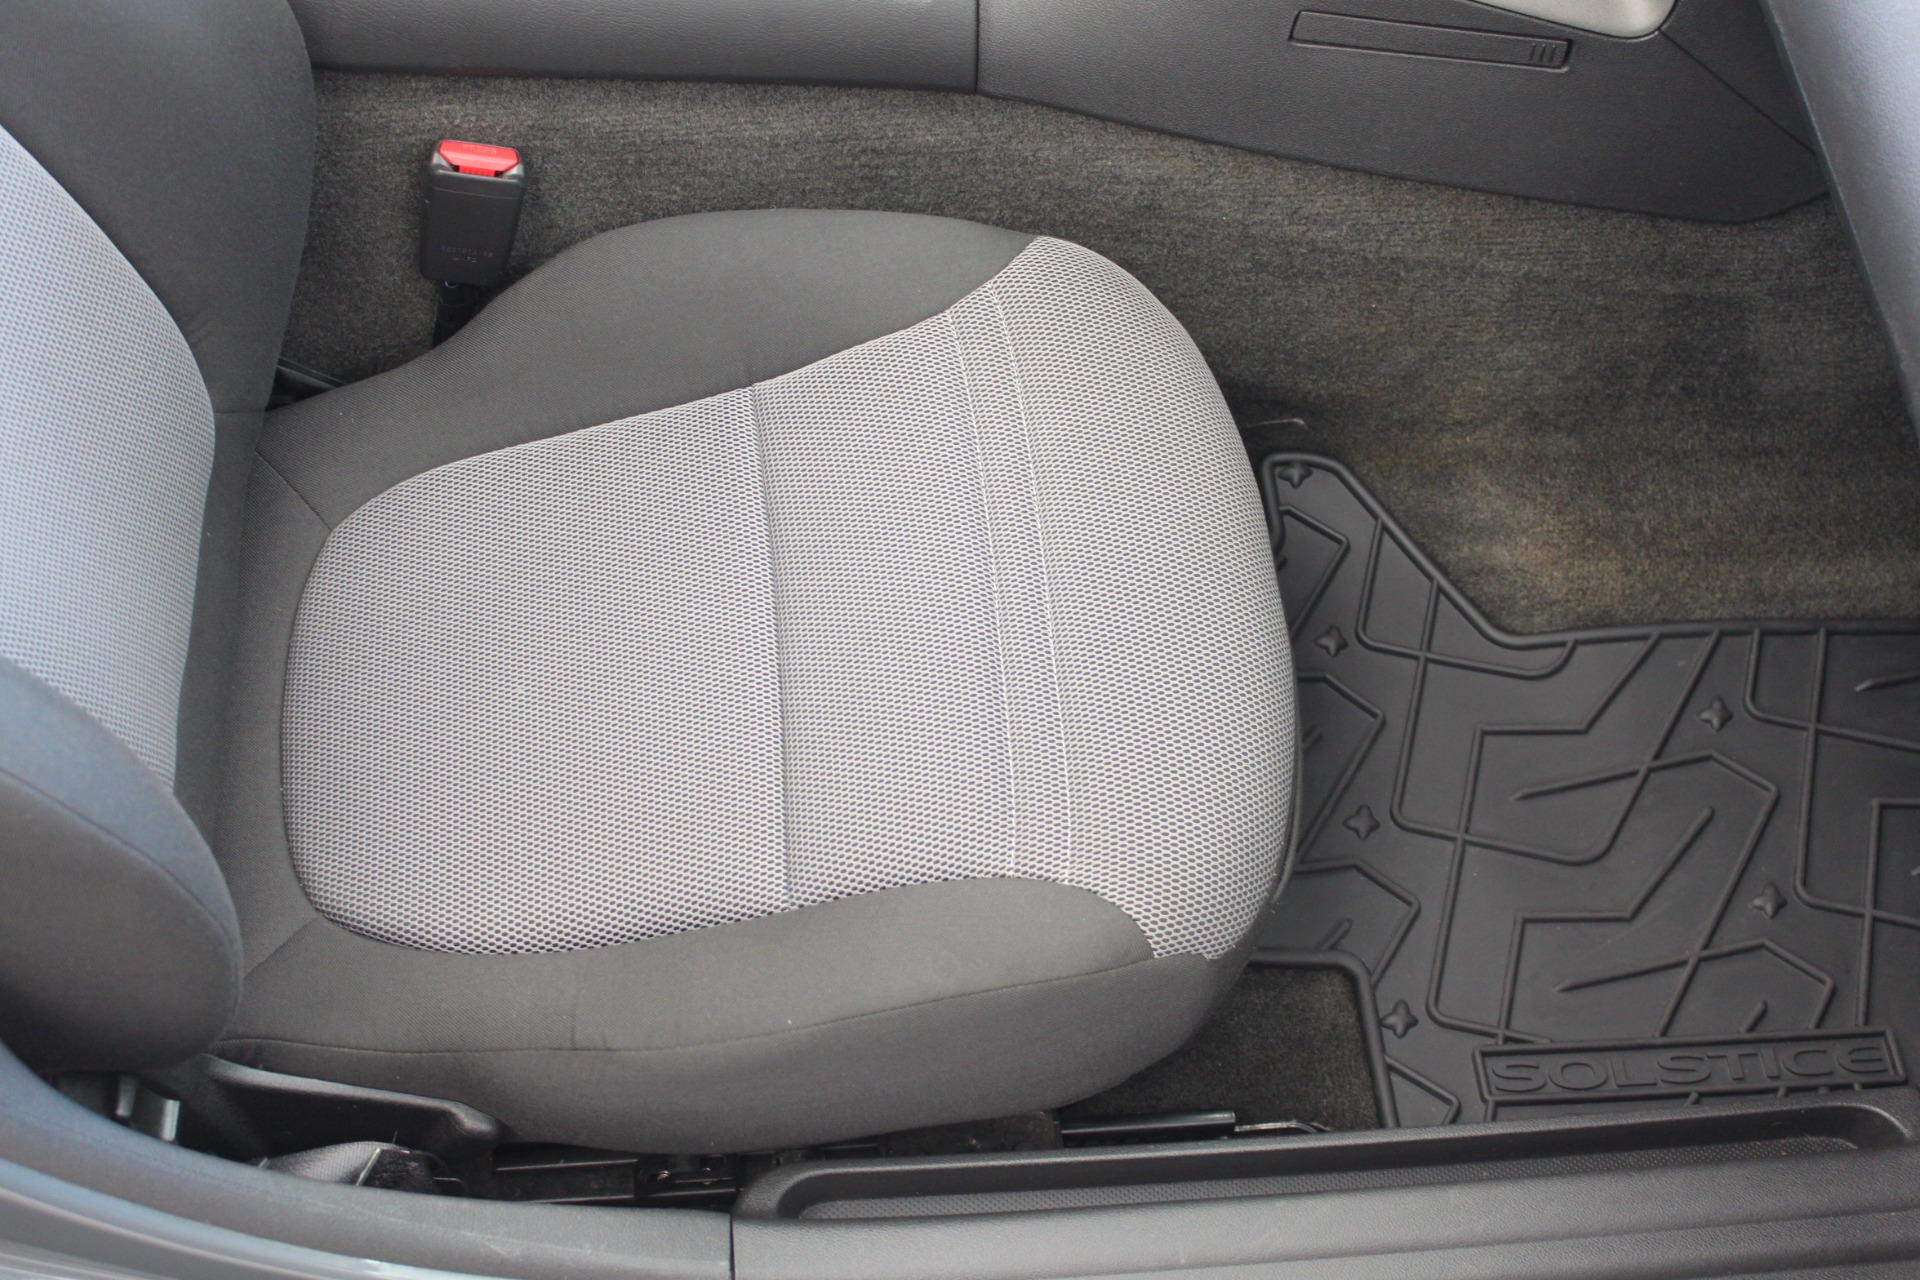 Used-2009-Pontiac-Solstice-Convertible-Fiat